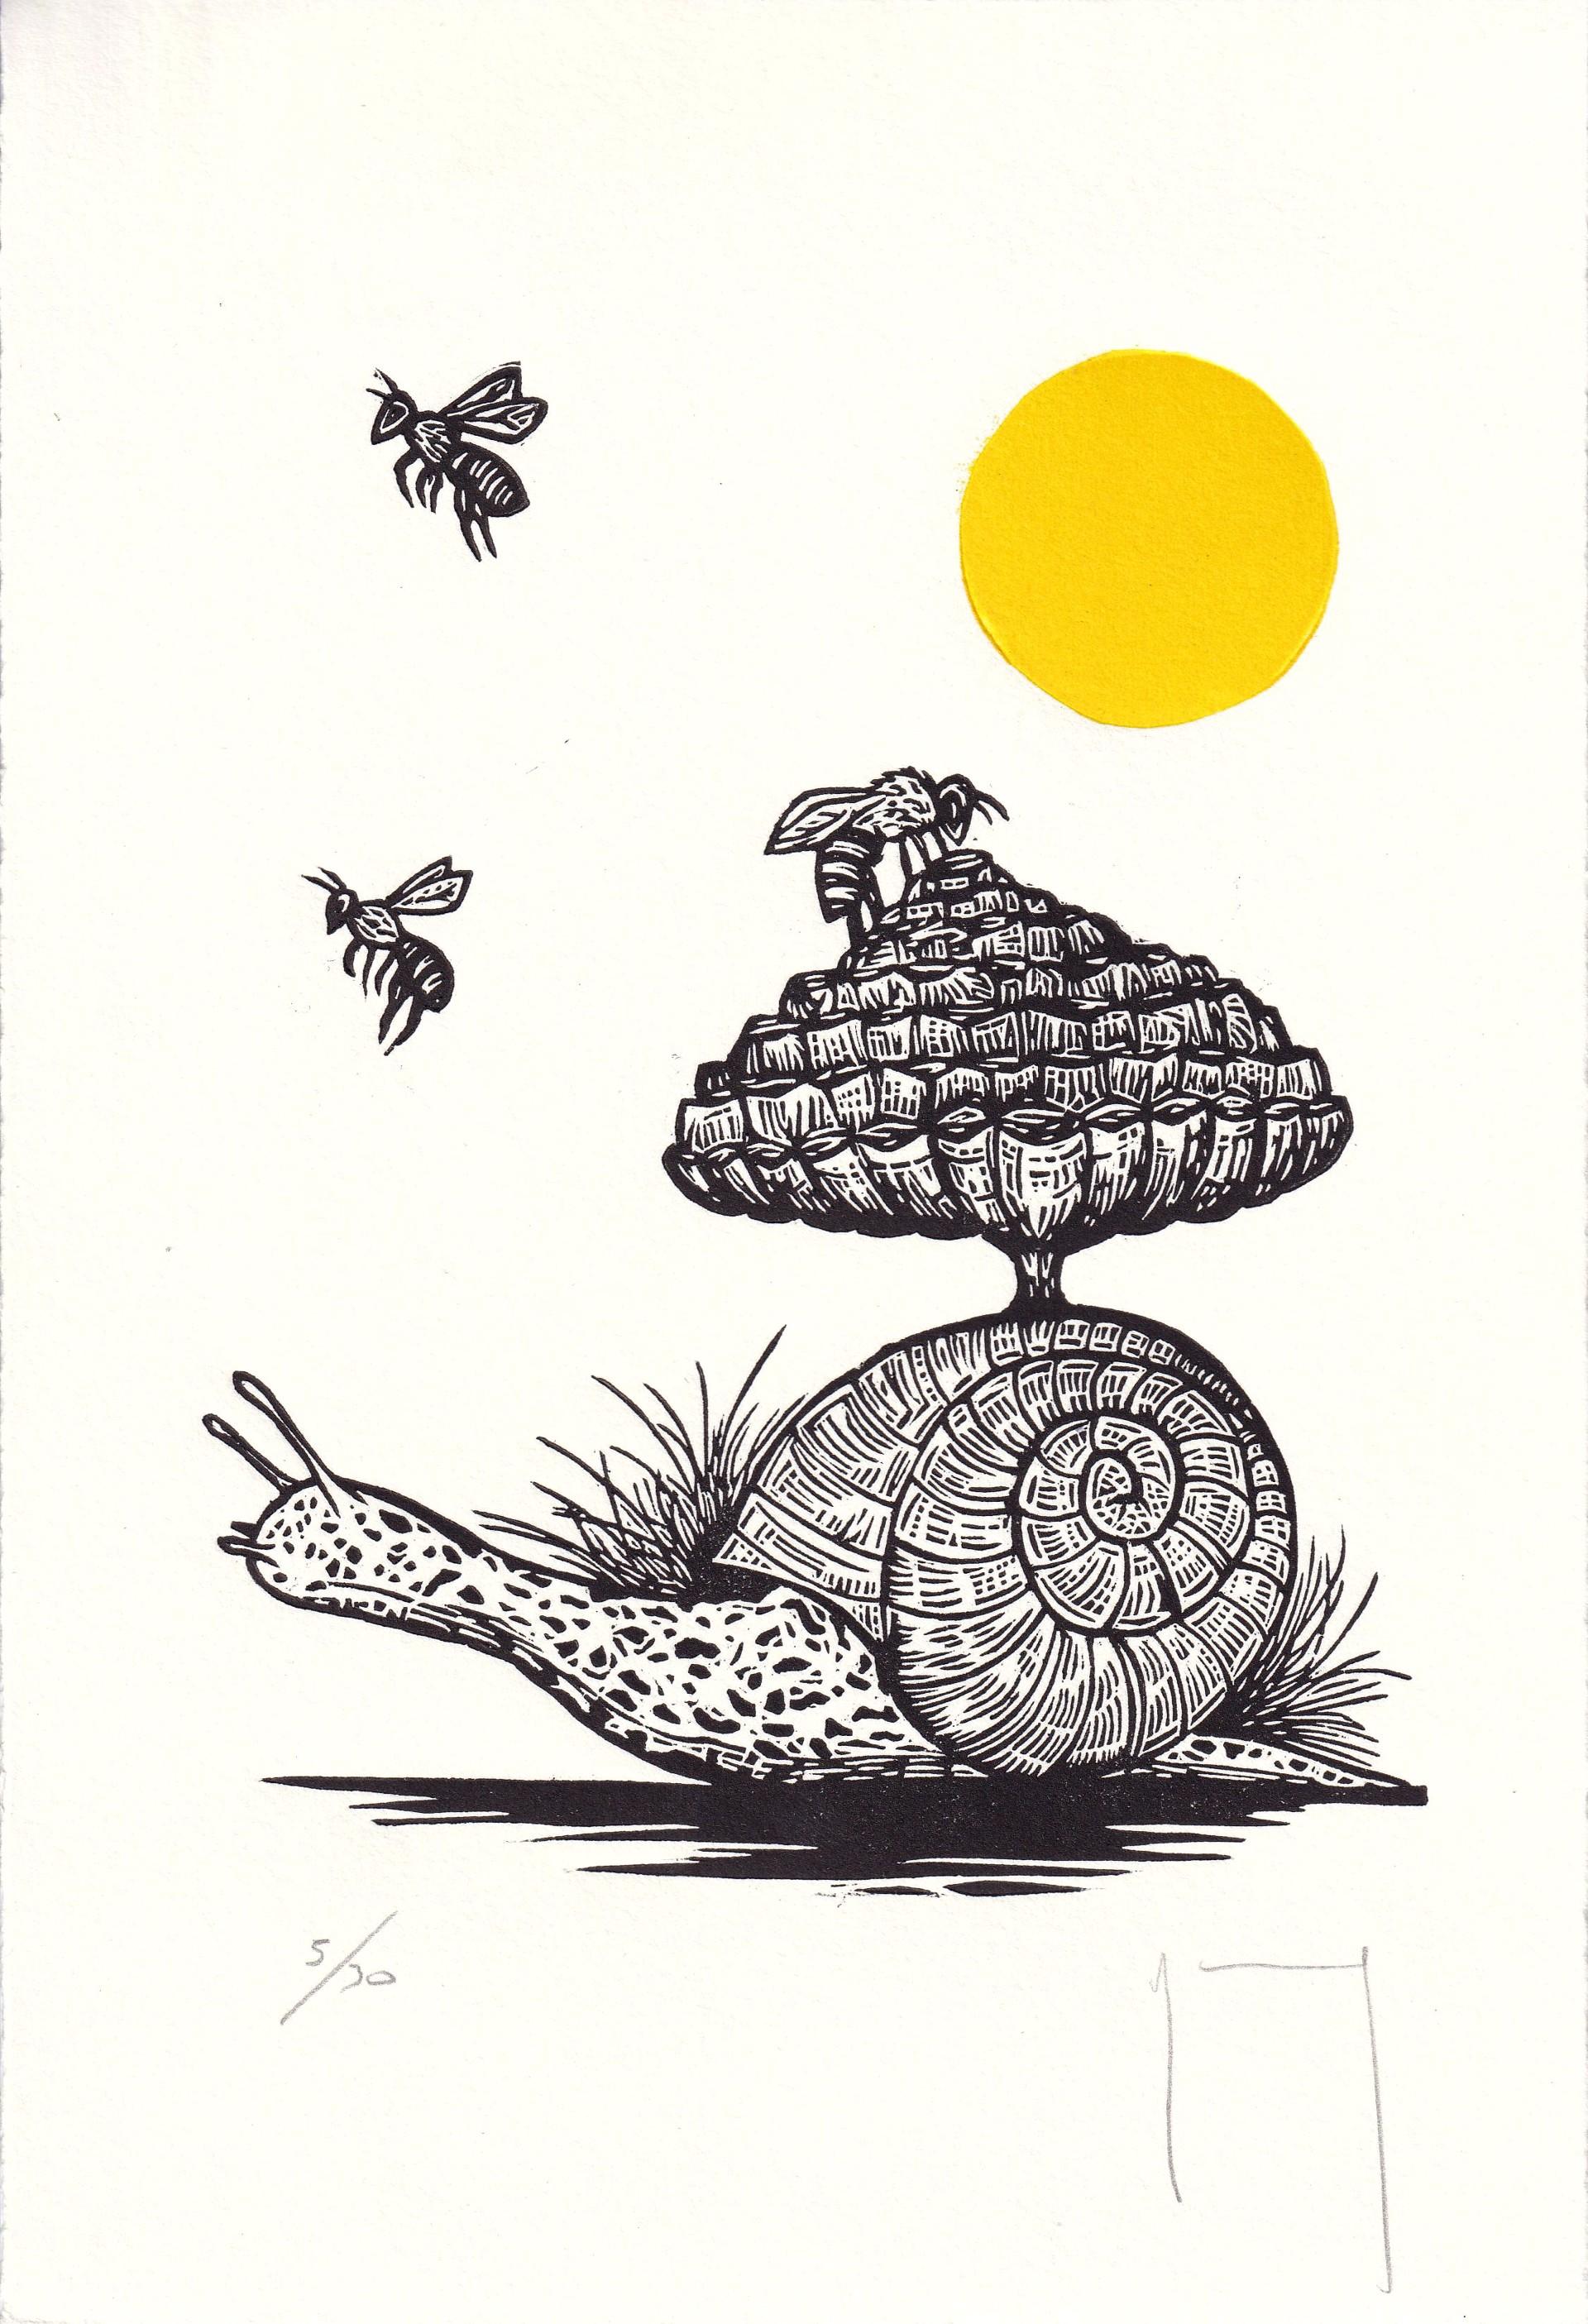 Serie Sol (Caracol y Abejas) by Miguel Jimenez Martinez